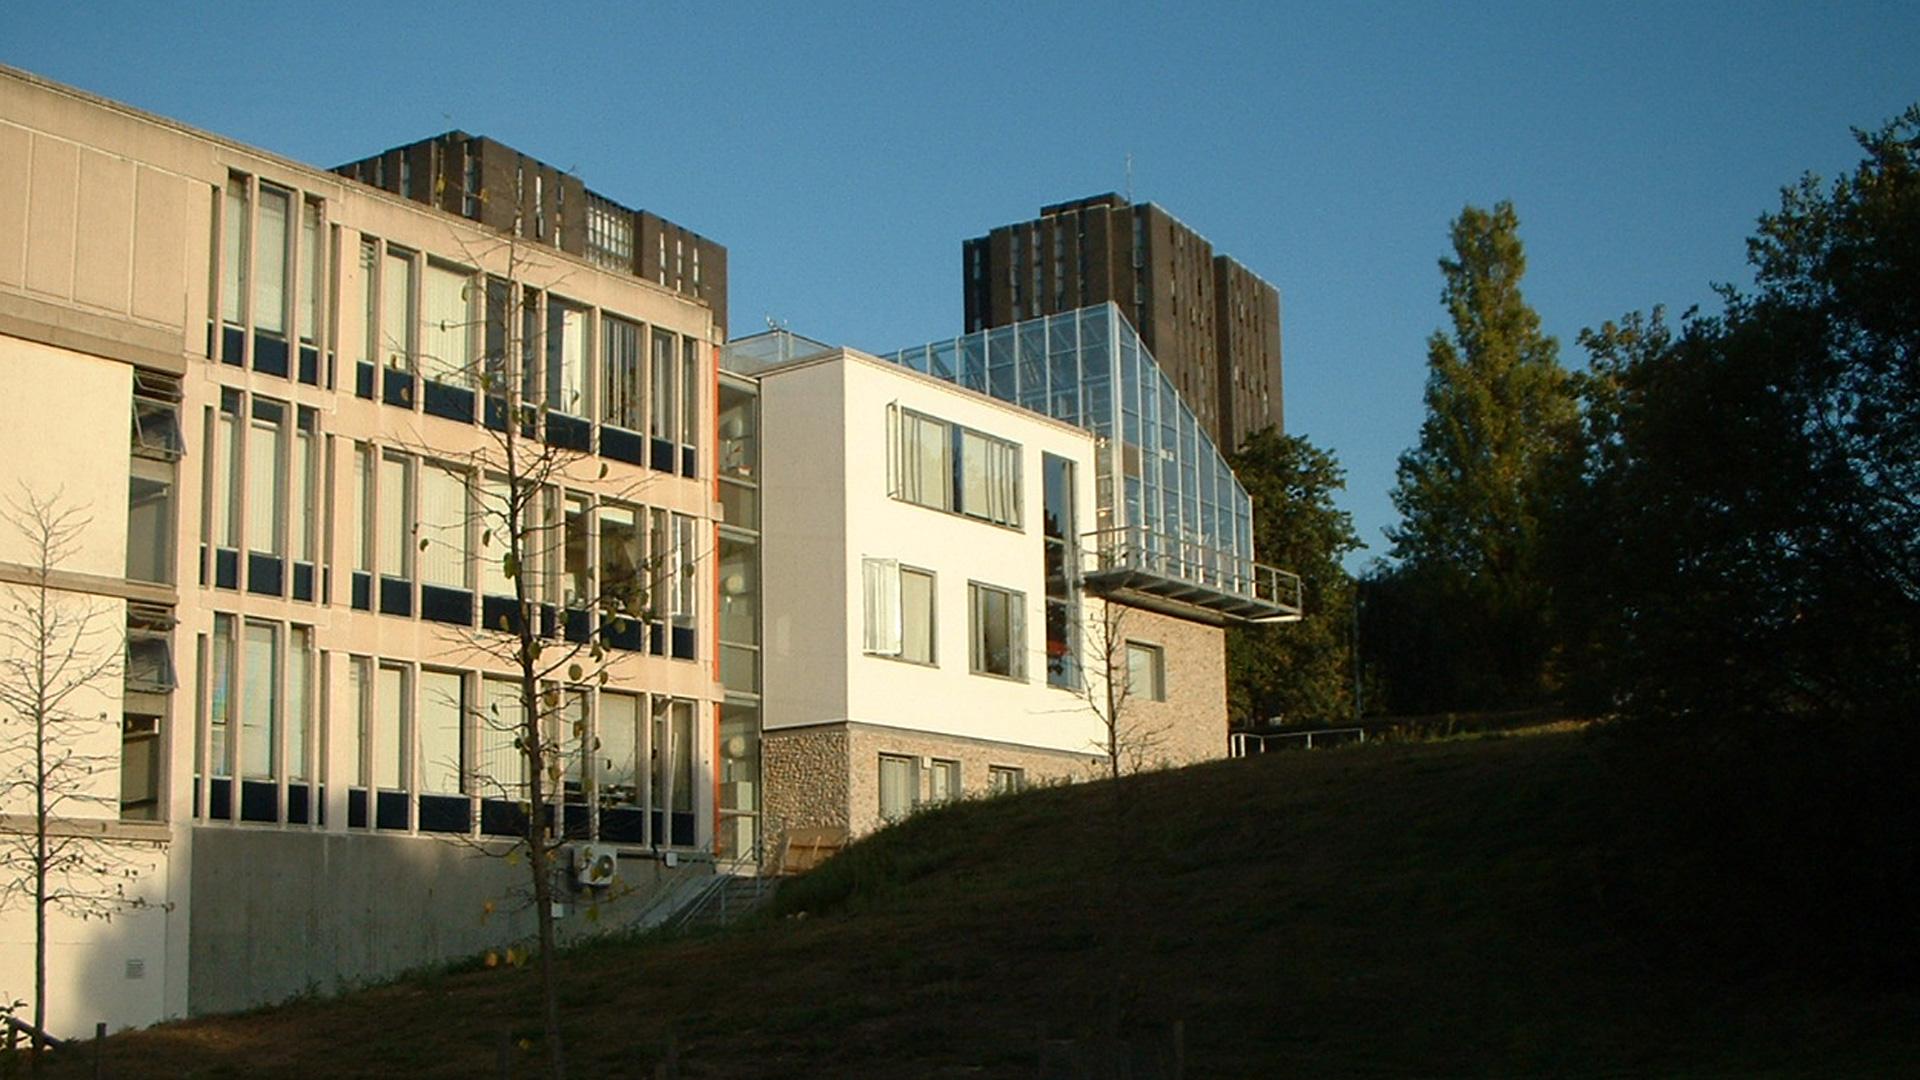 Biological Sciences University of Essex